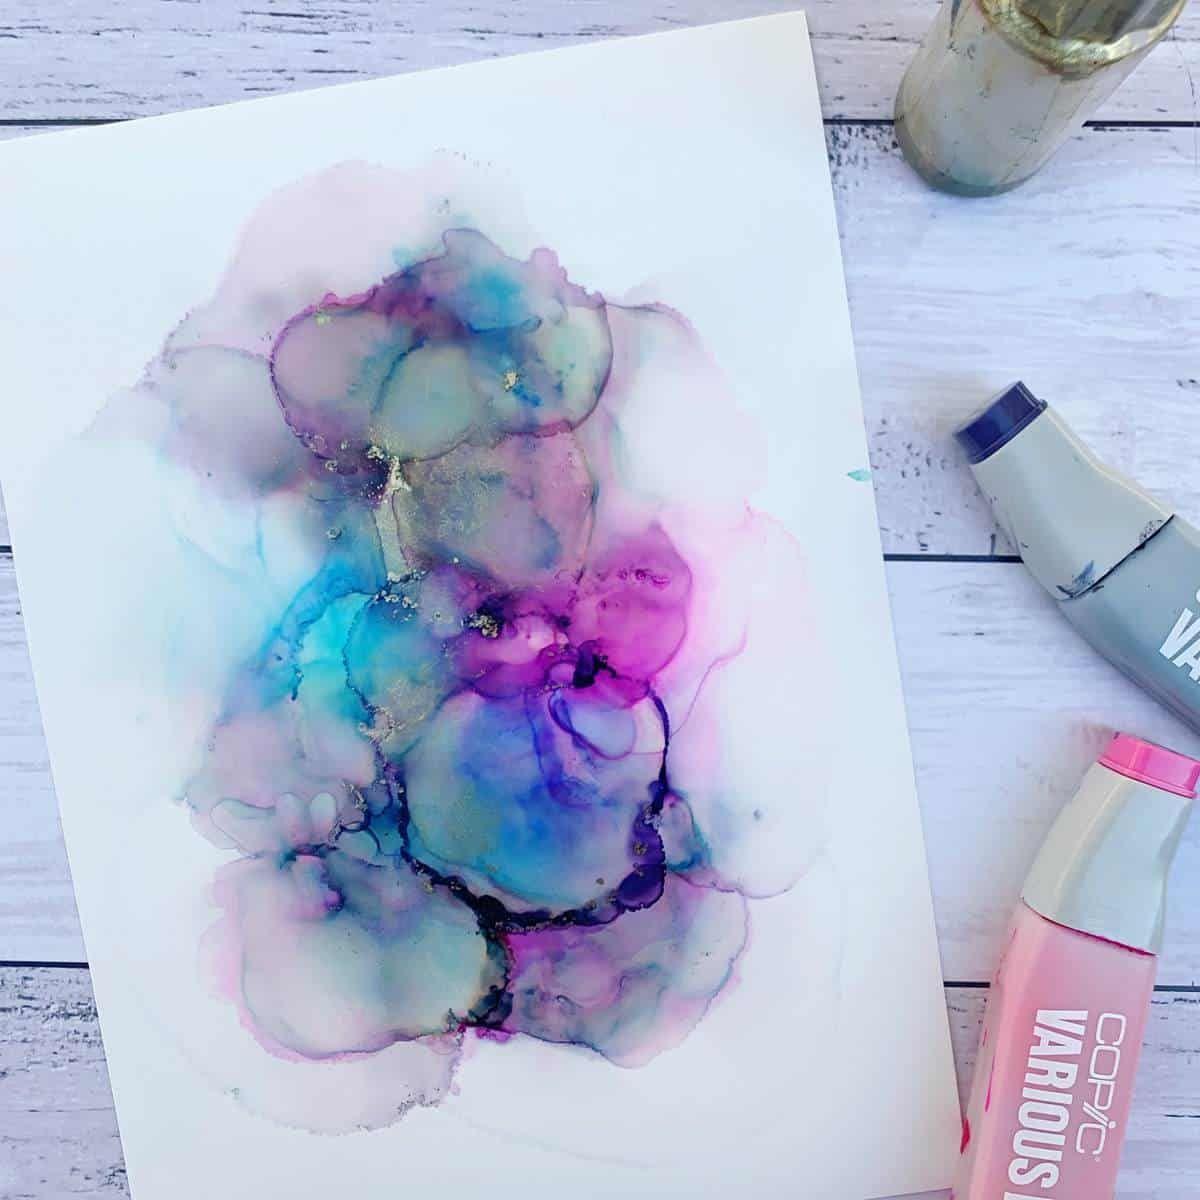 Learning more about alcohol inks can help you understand how the fade effects works. #fluidartwork #art #fluidart #fluidartist